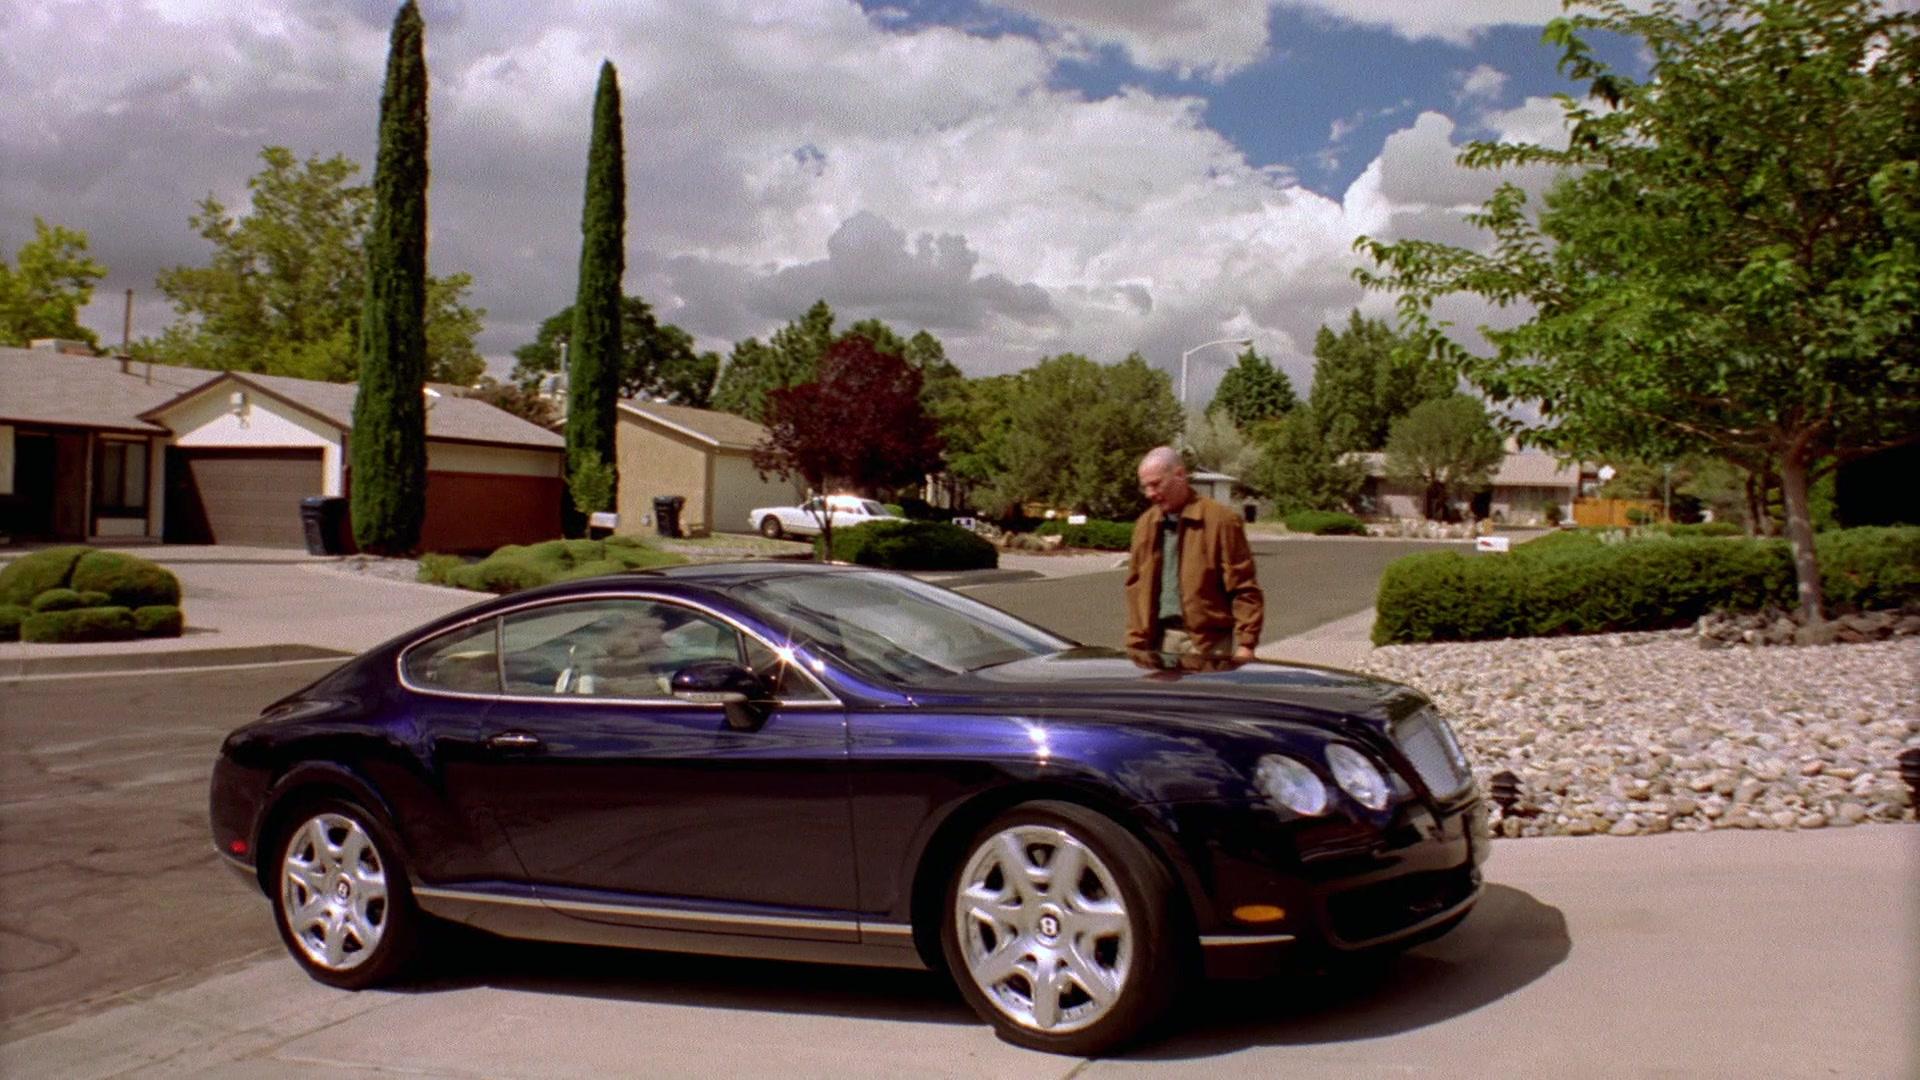 bentley continental gt luxury vehicle  breaking bad season  episode  peekaboo  tv show